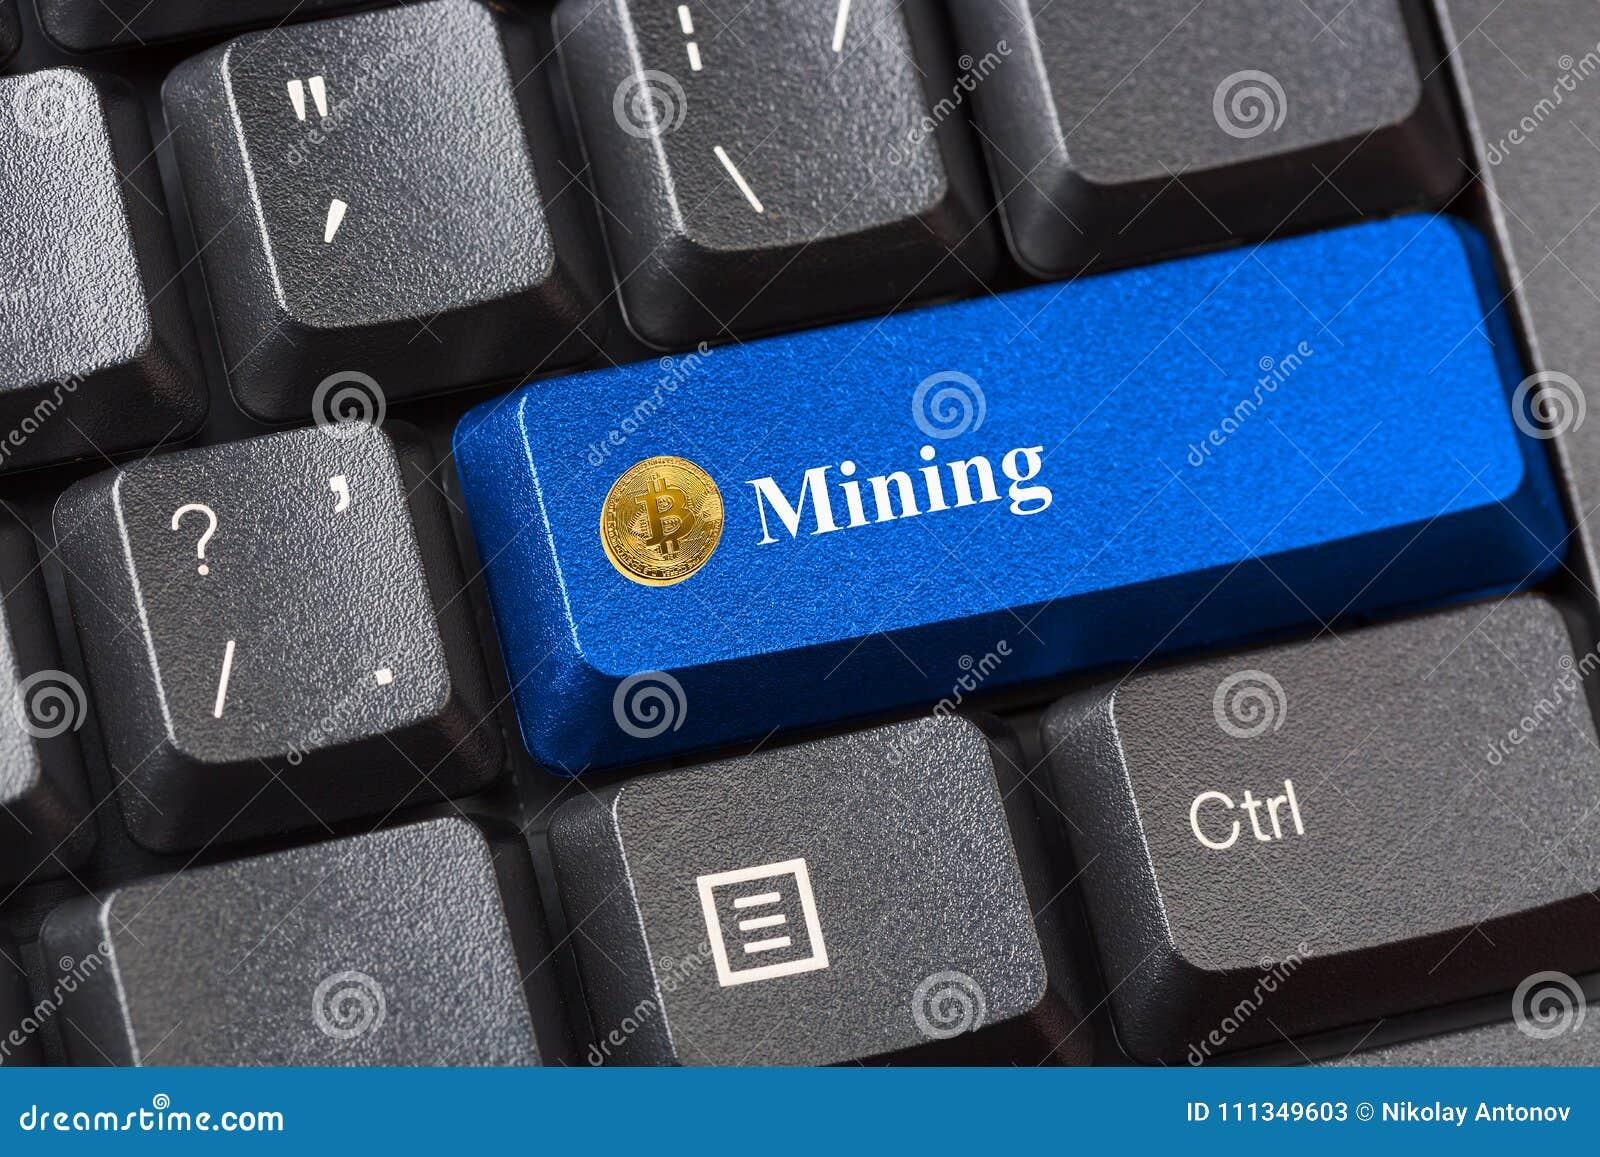 Amir chetrit bitcoin price